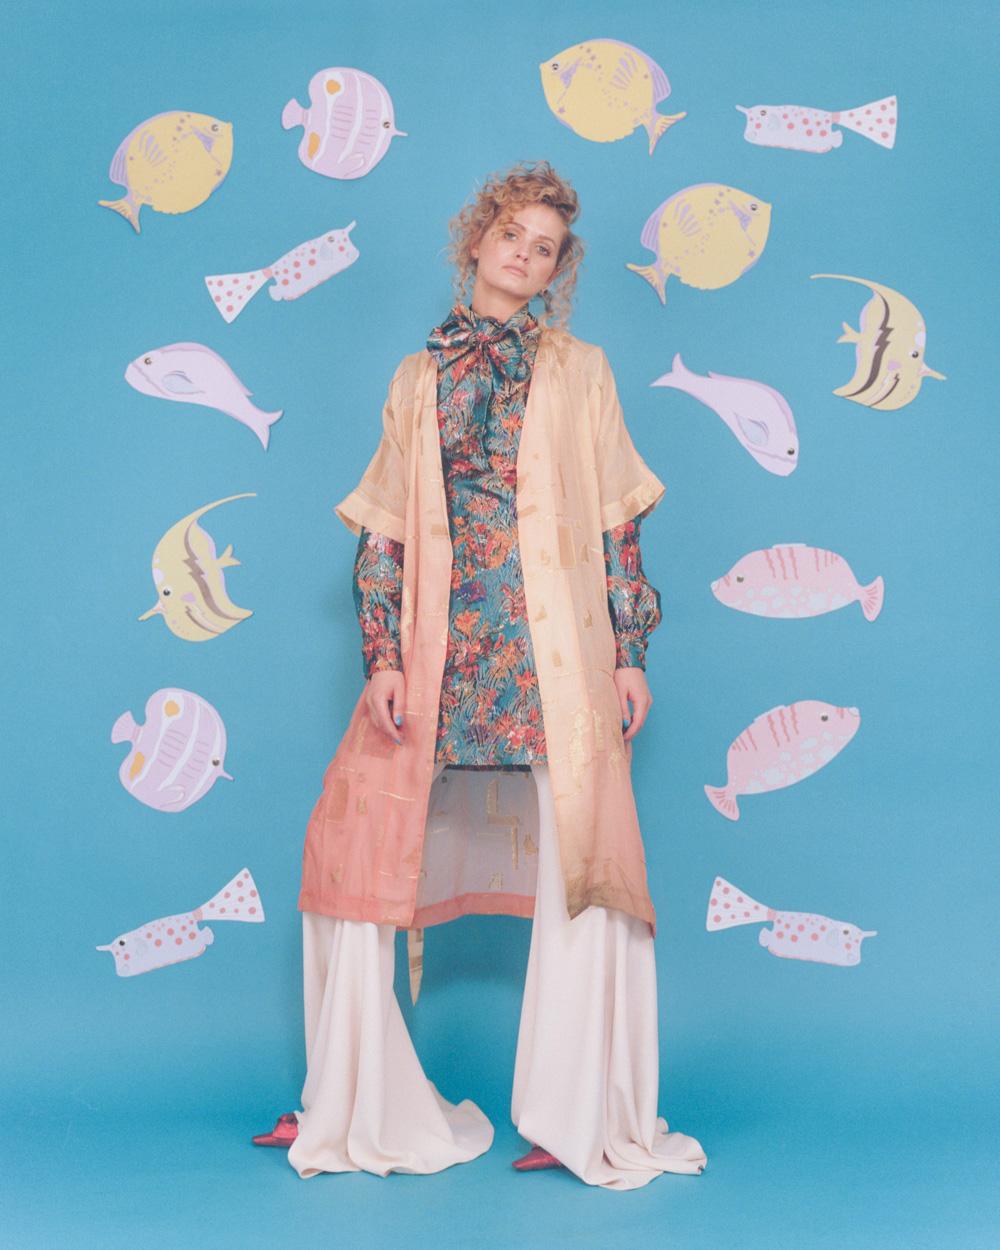 kimono   STINE GOYA   dress   YSL  pants   LANA MUELLER   shoes   MOSCHINO